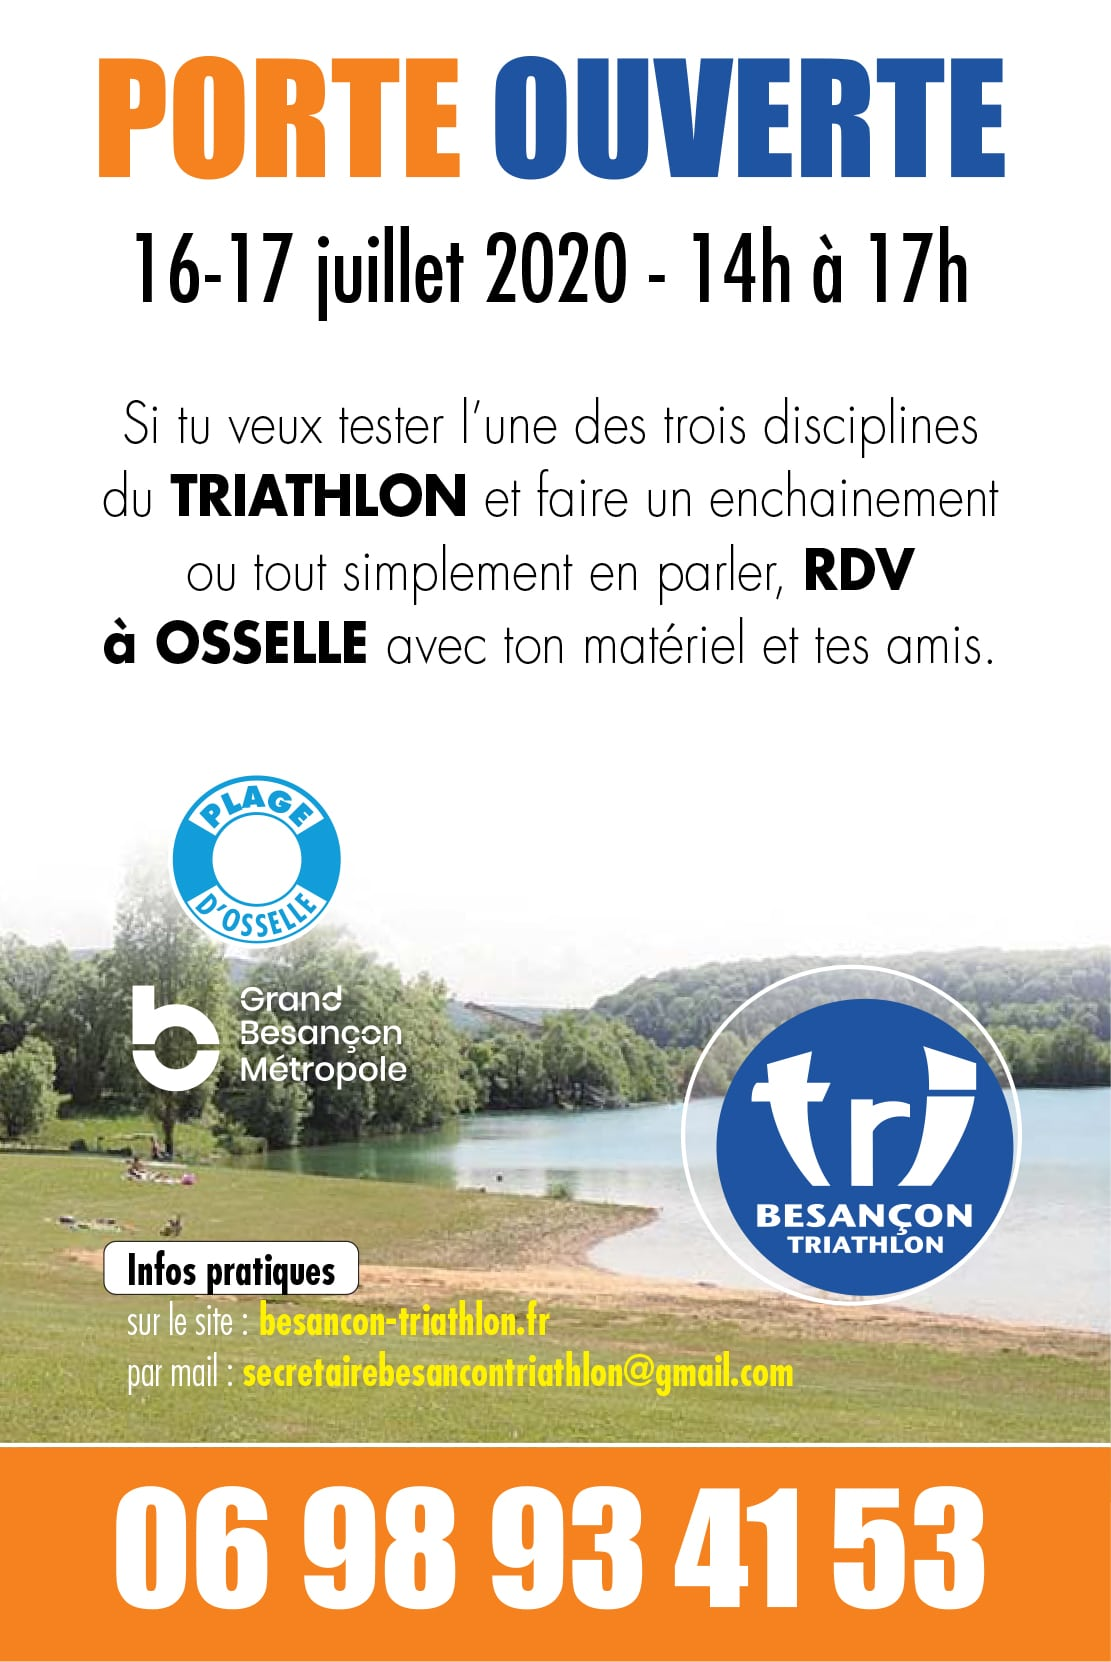 Porte Ouverte Besançon Triathlon Osselle 2020